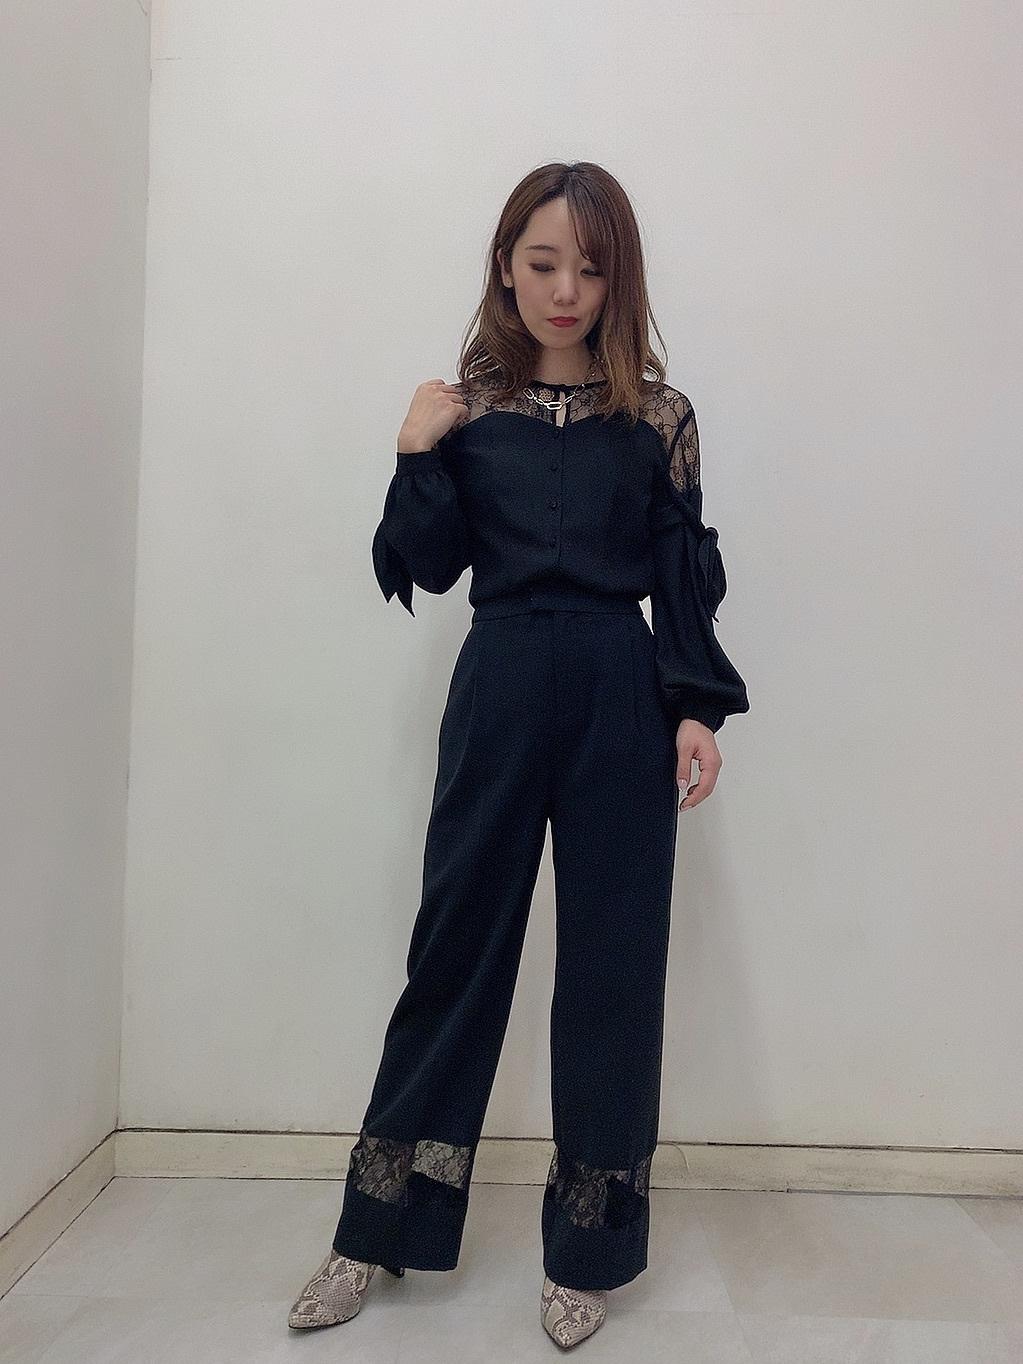 高瀬 智美(157cm)